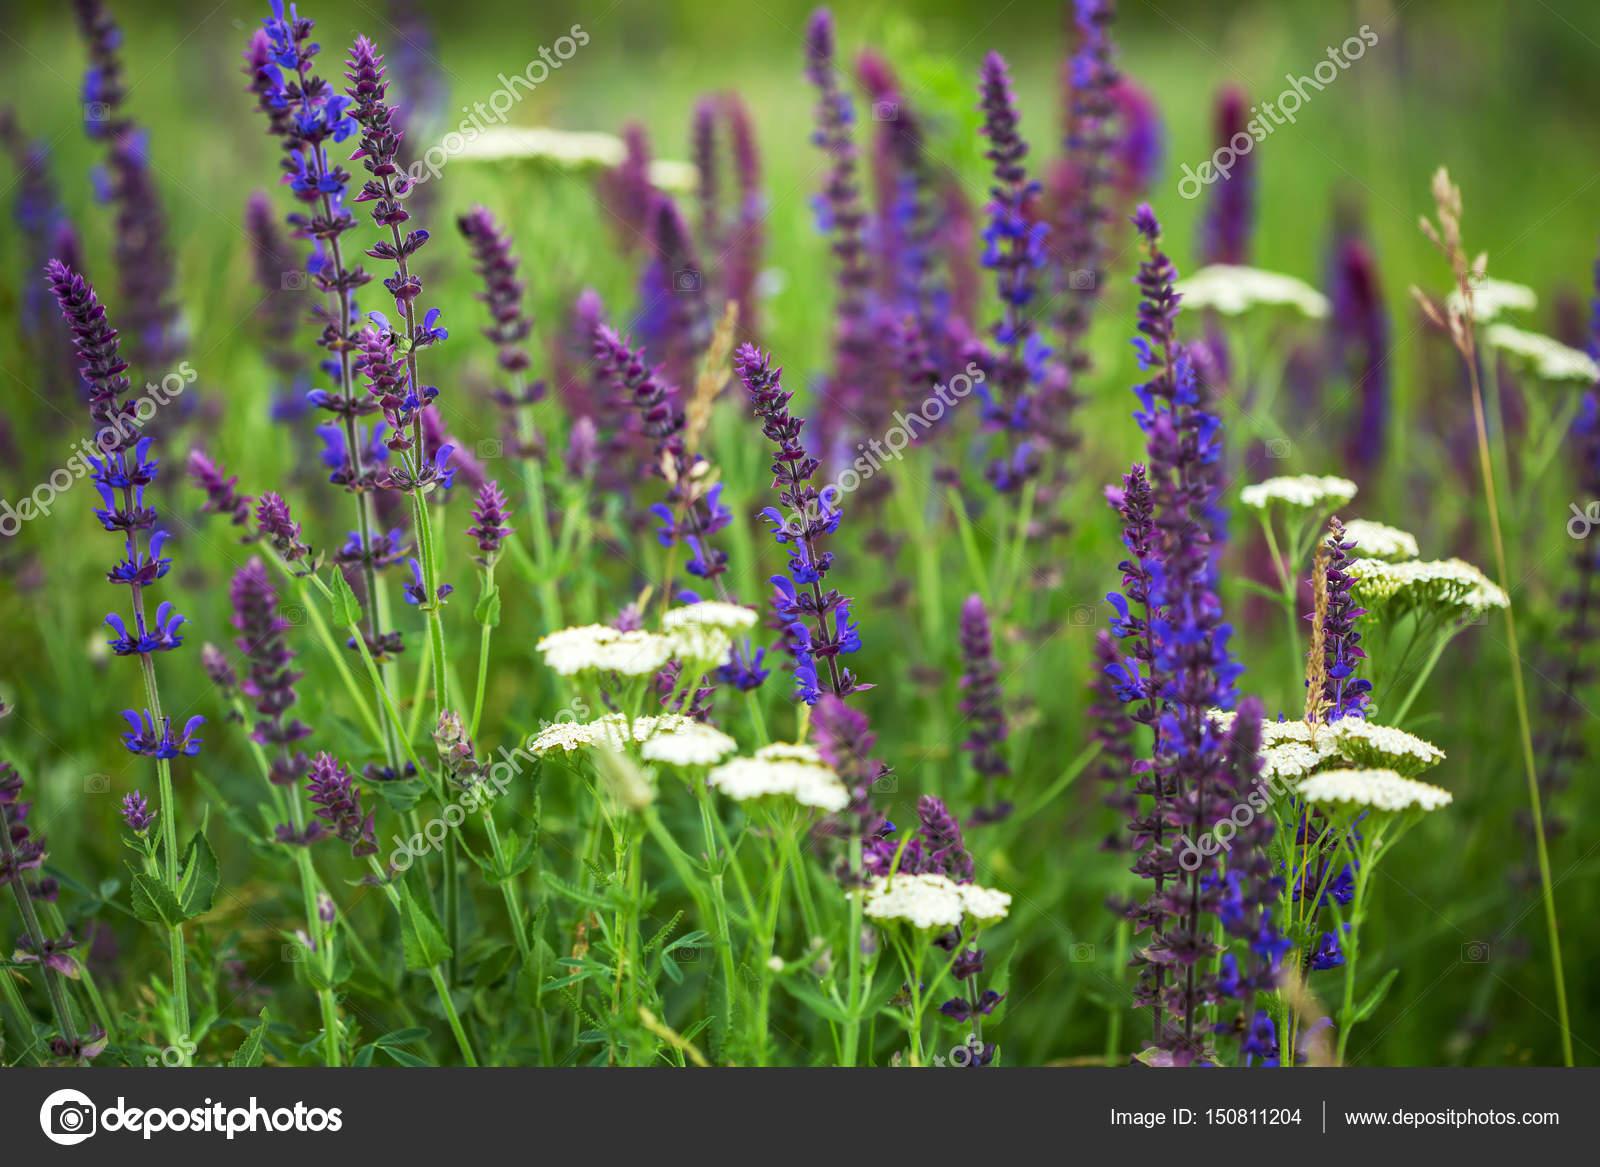 Purple Wild Flowers In The Grass Stock Photo Sichkarenkocom